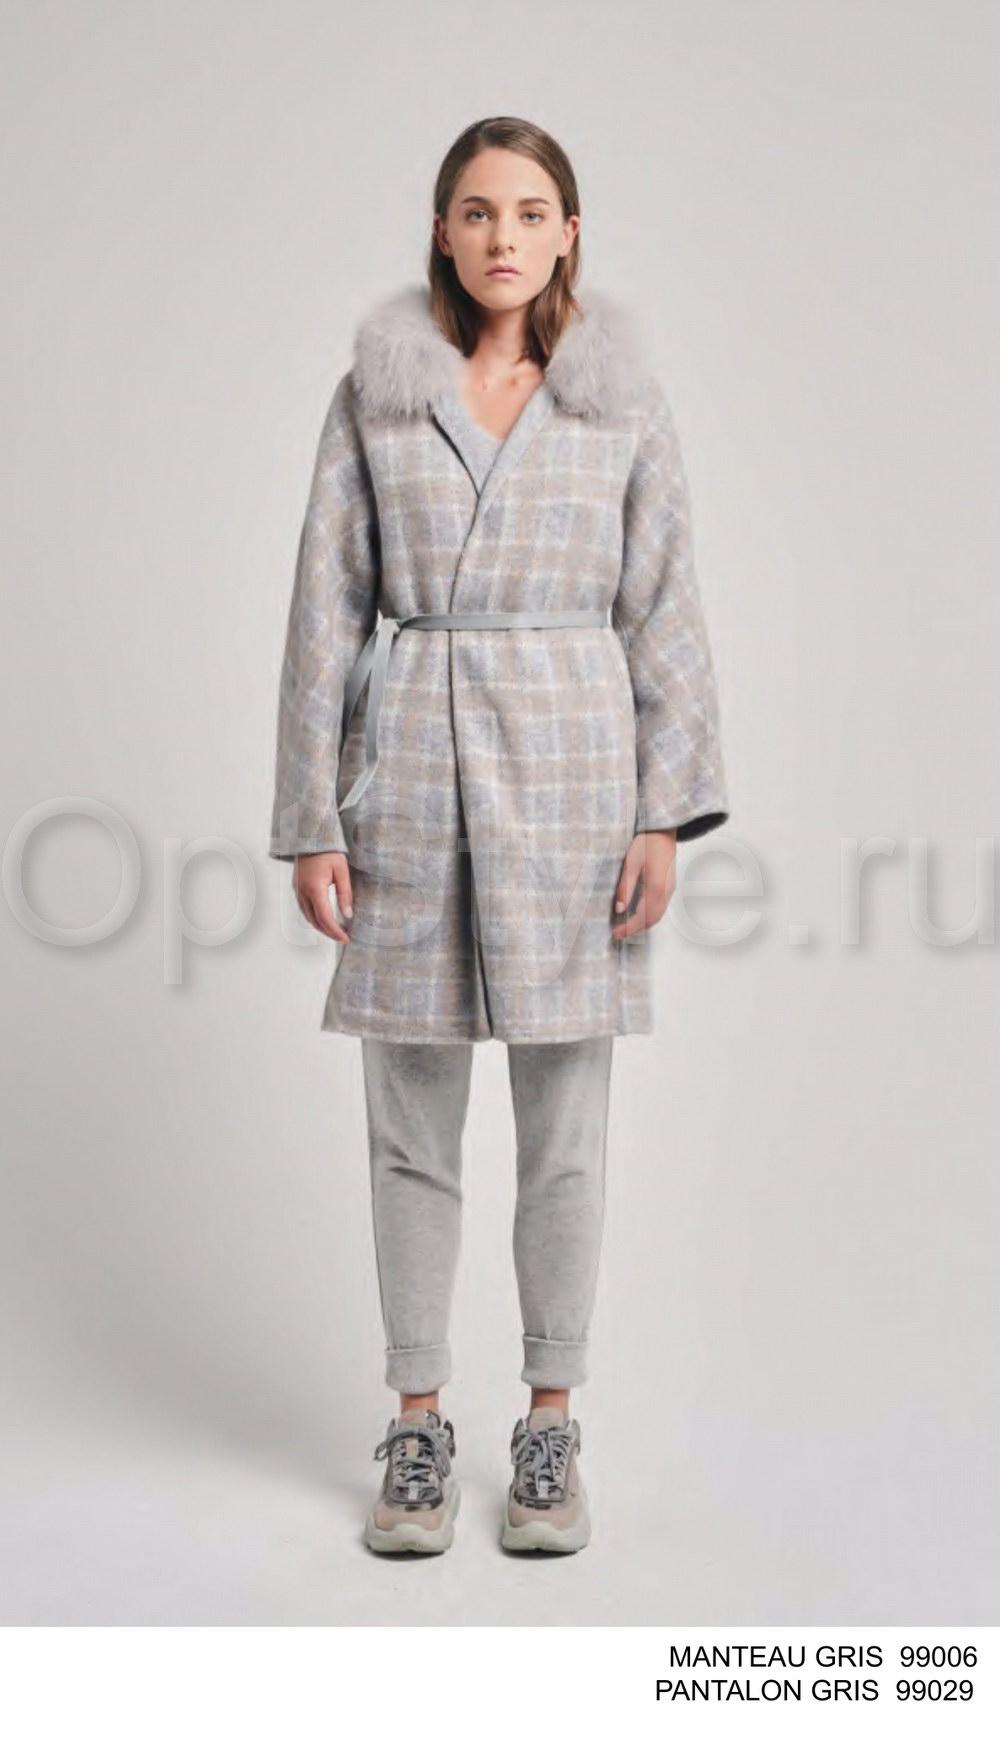 Interdee пальто 99006 Manteau 52280р официальный каталог